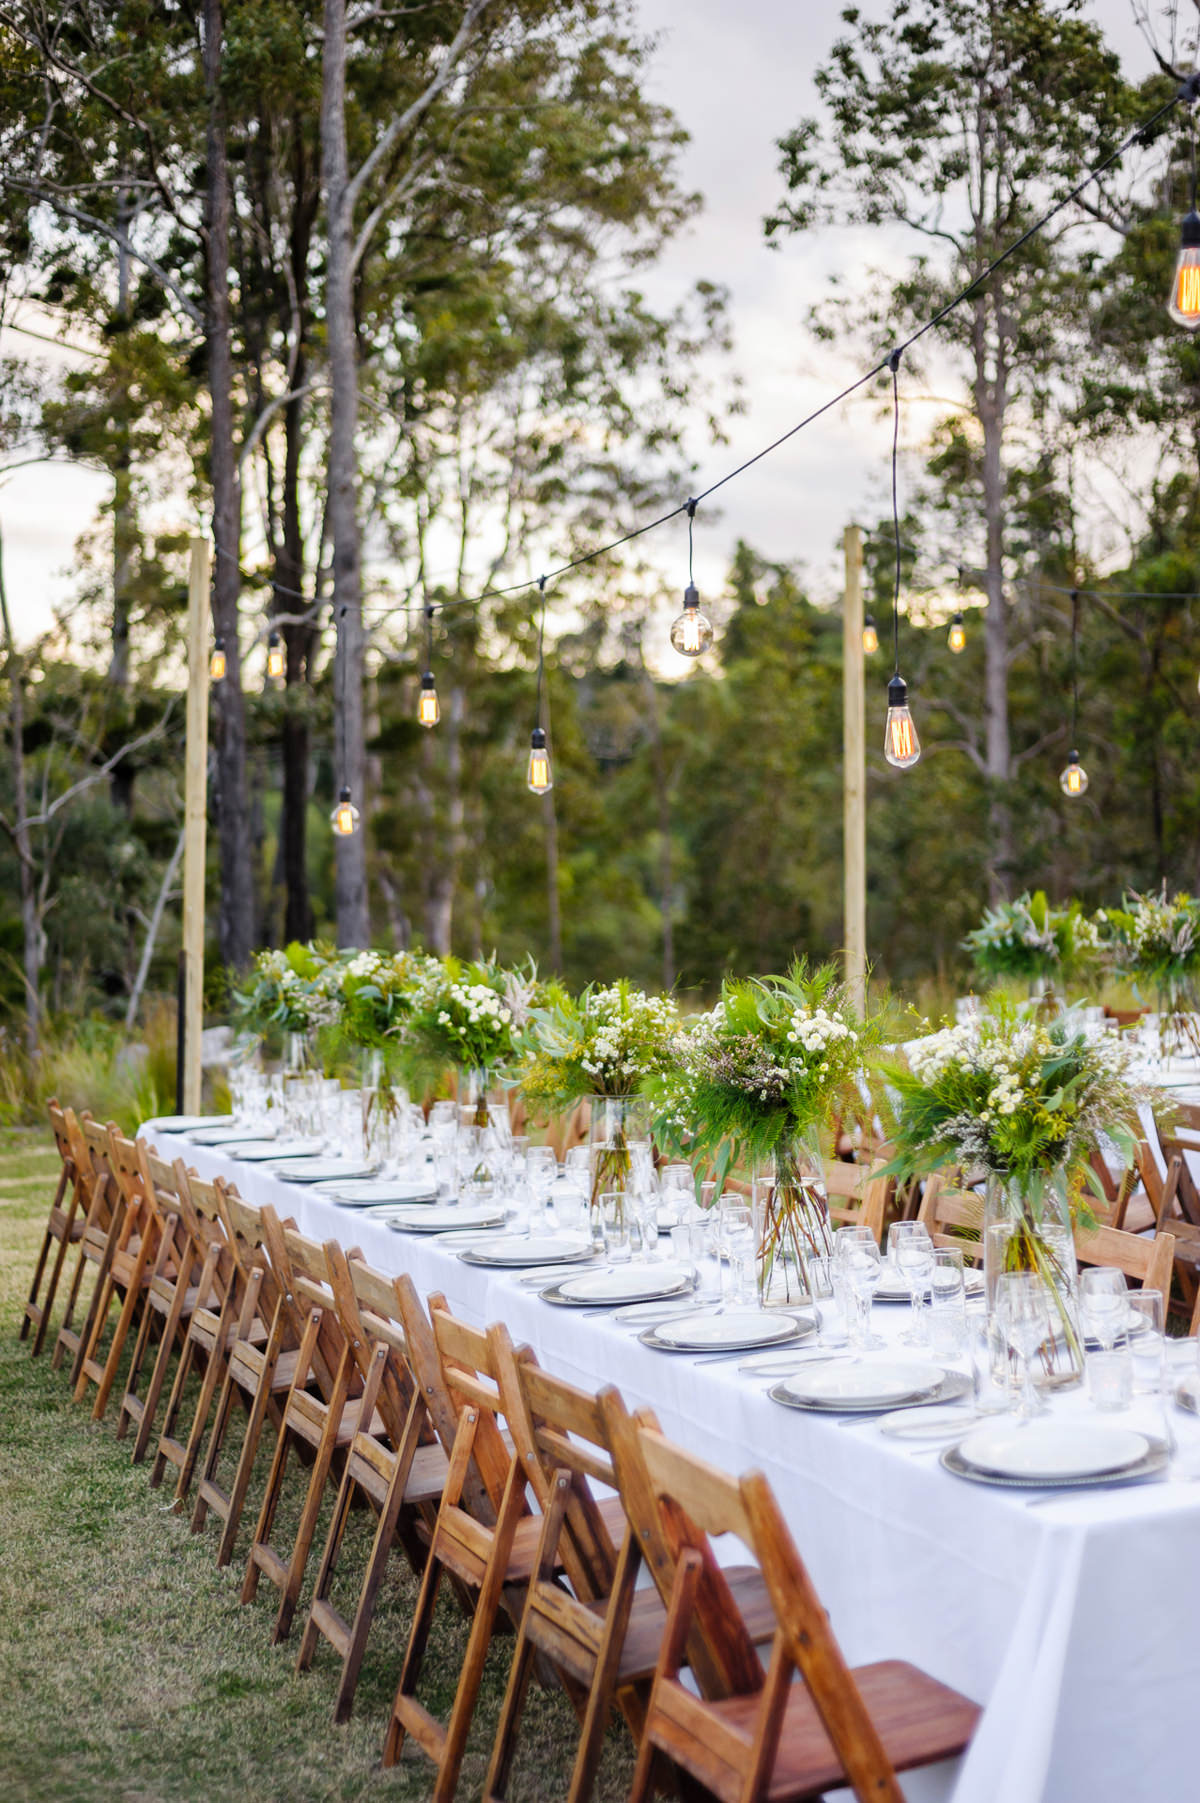 Australian Outdoor Wedding Ideas With Greenery - Polka Dot Bride